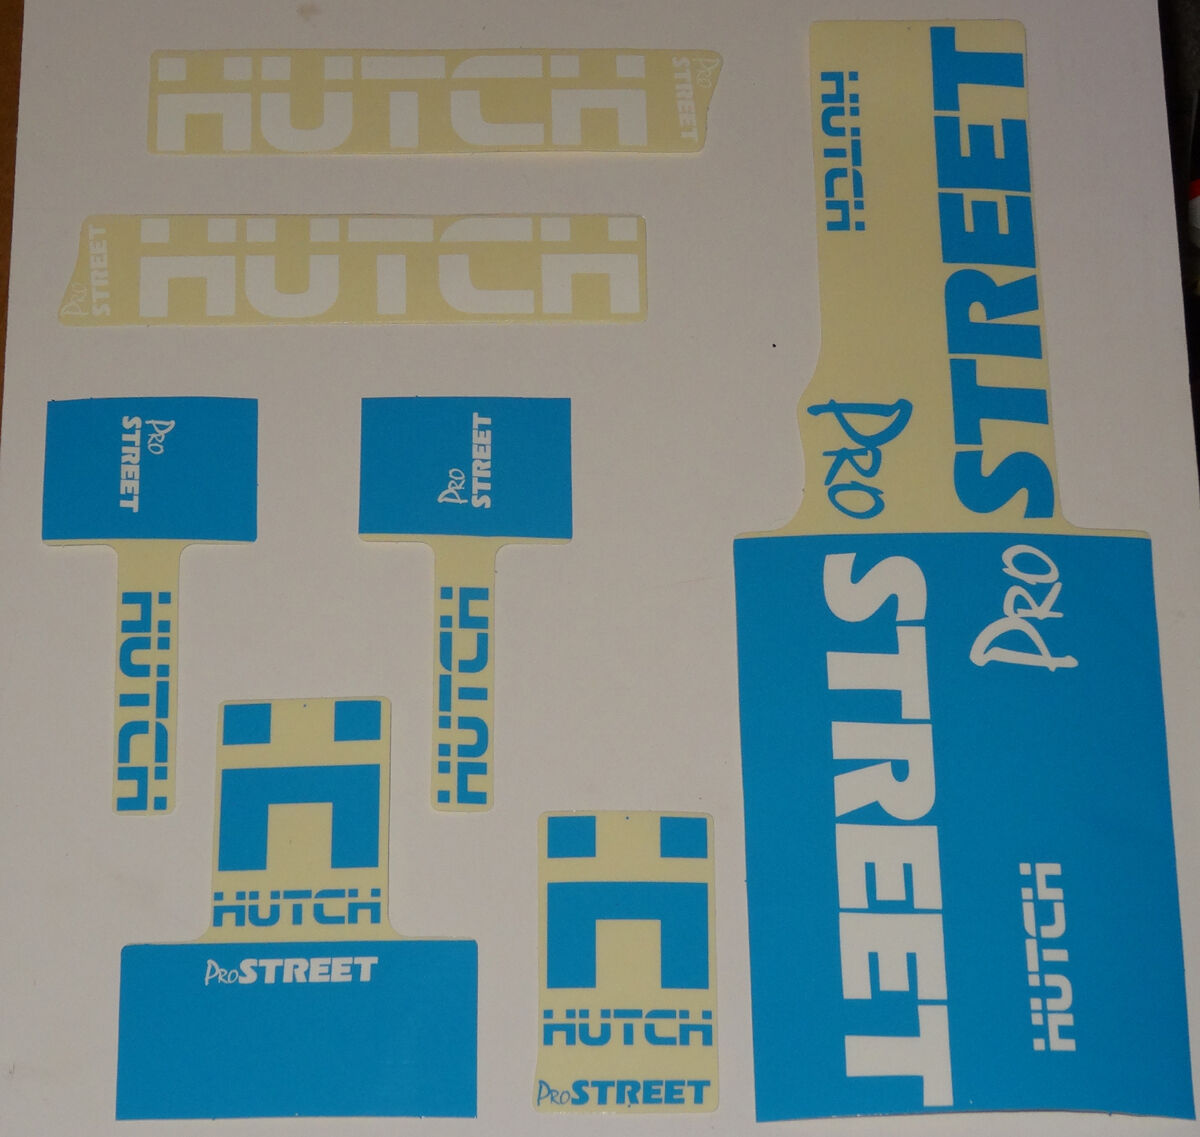 HUTCH Street BMX Sticker Set  NOS Old School gratuitostile Decal set Original 80s